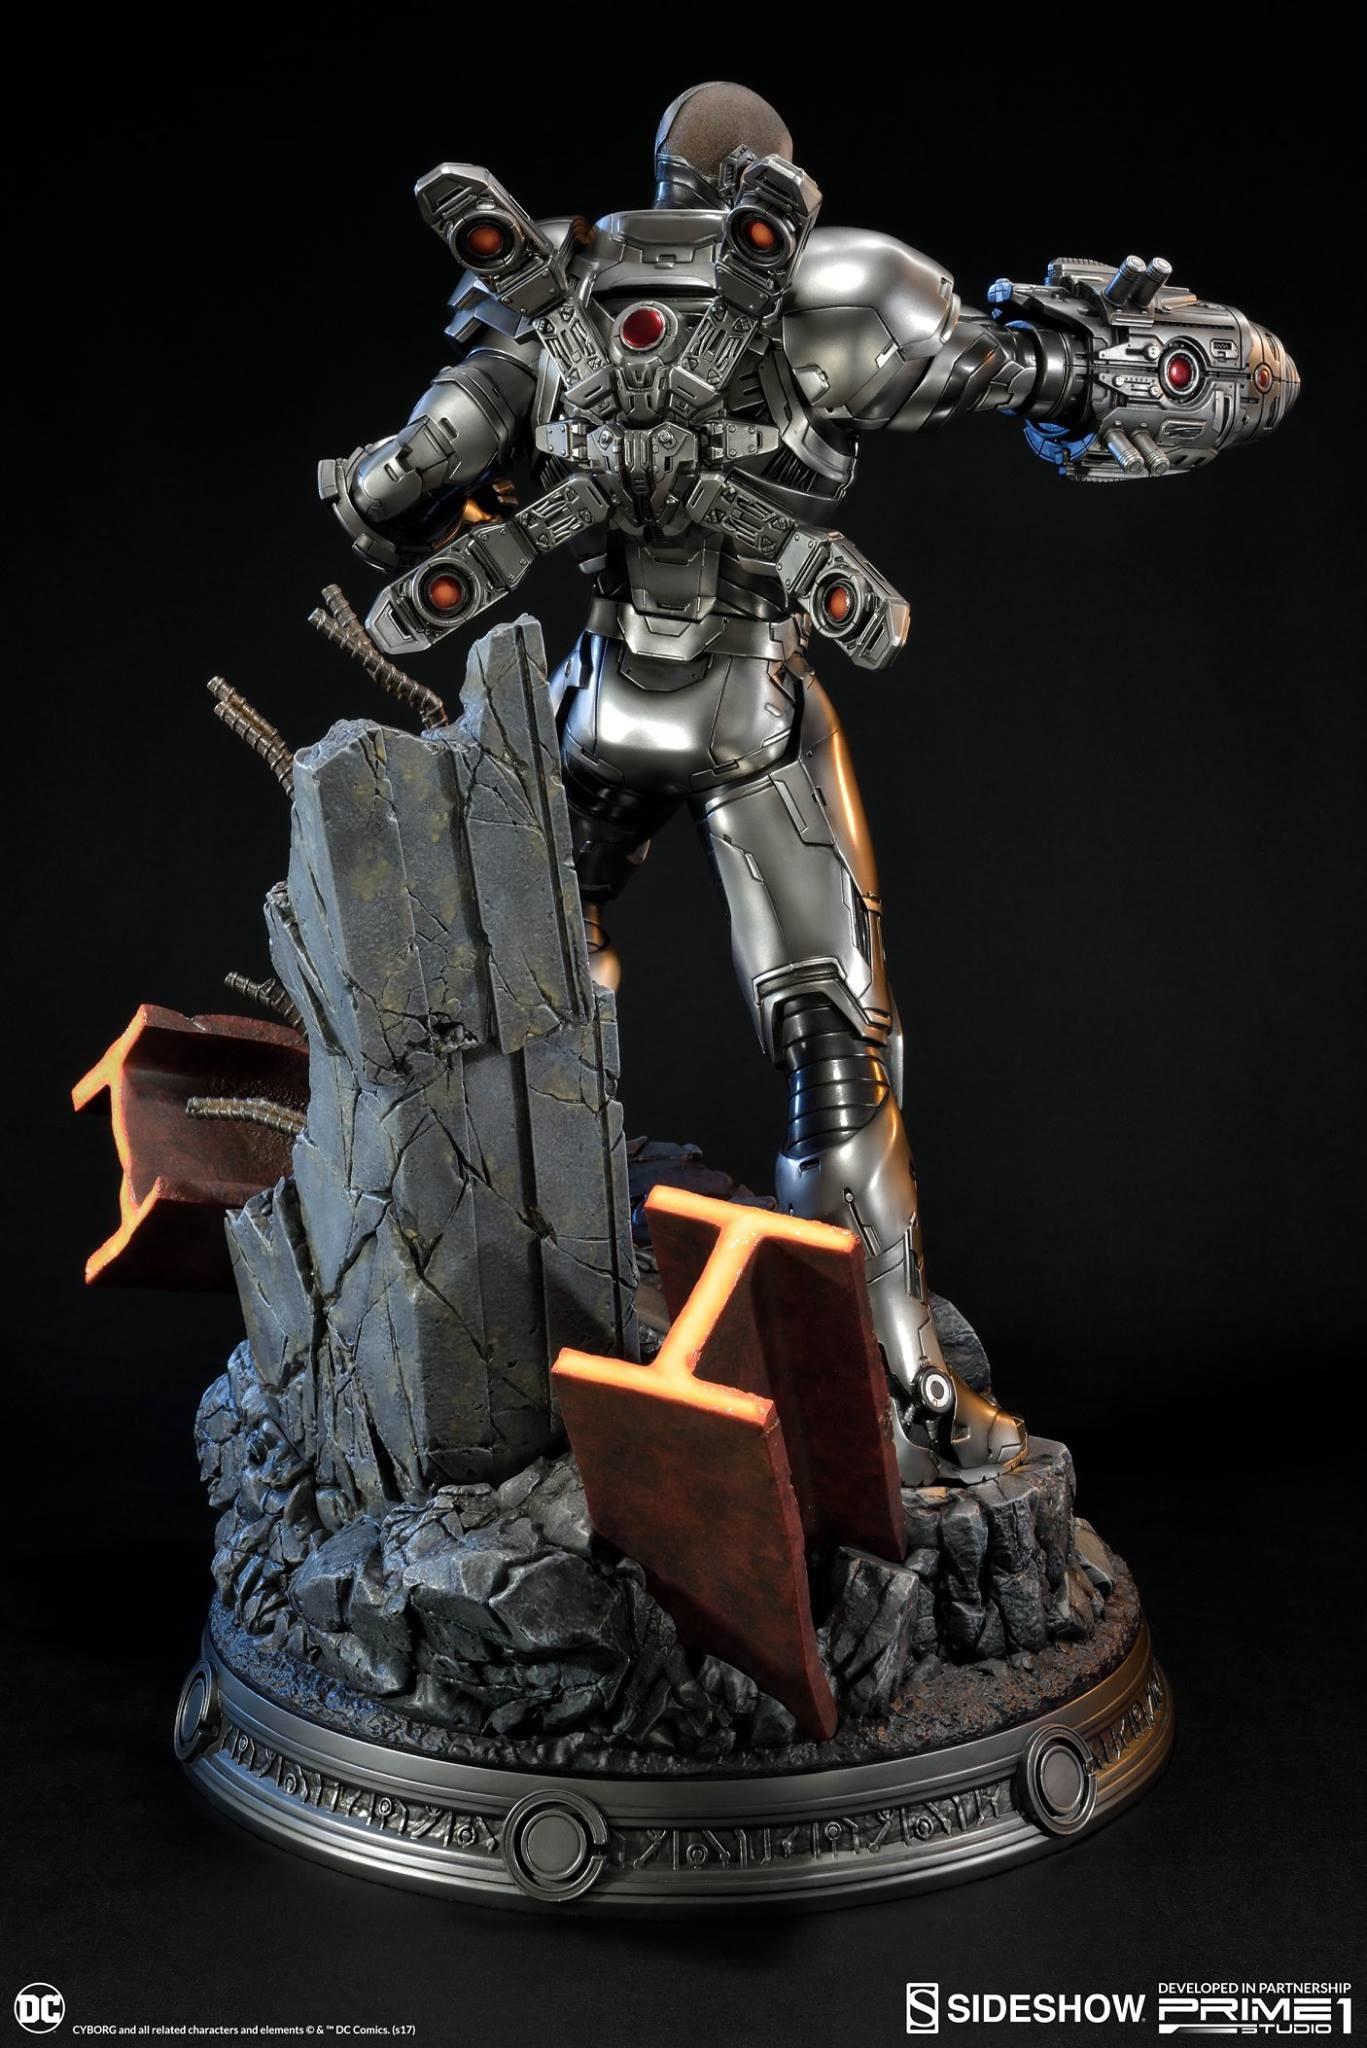 Adam fisher prime 1 studio dc cyborg statue 005